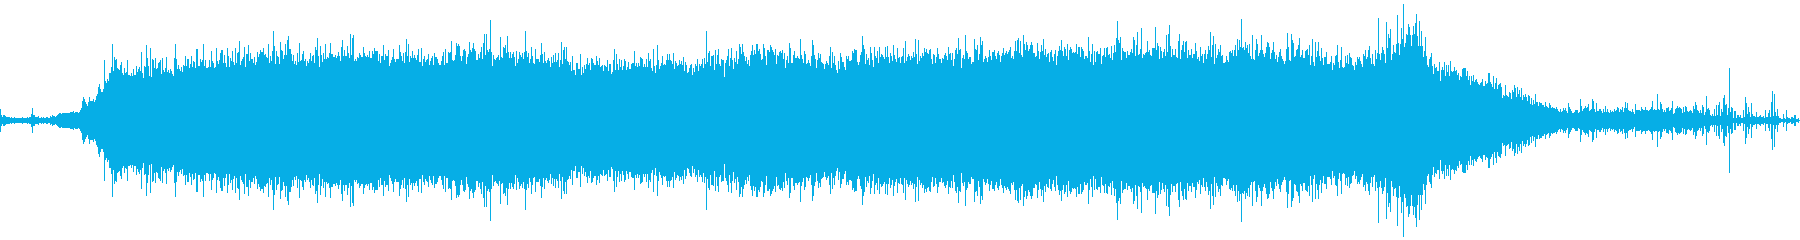 40 Hp船外機:オンボード:スタ...の再生済みの波形